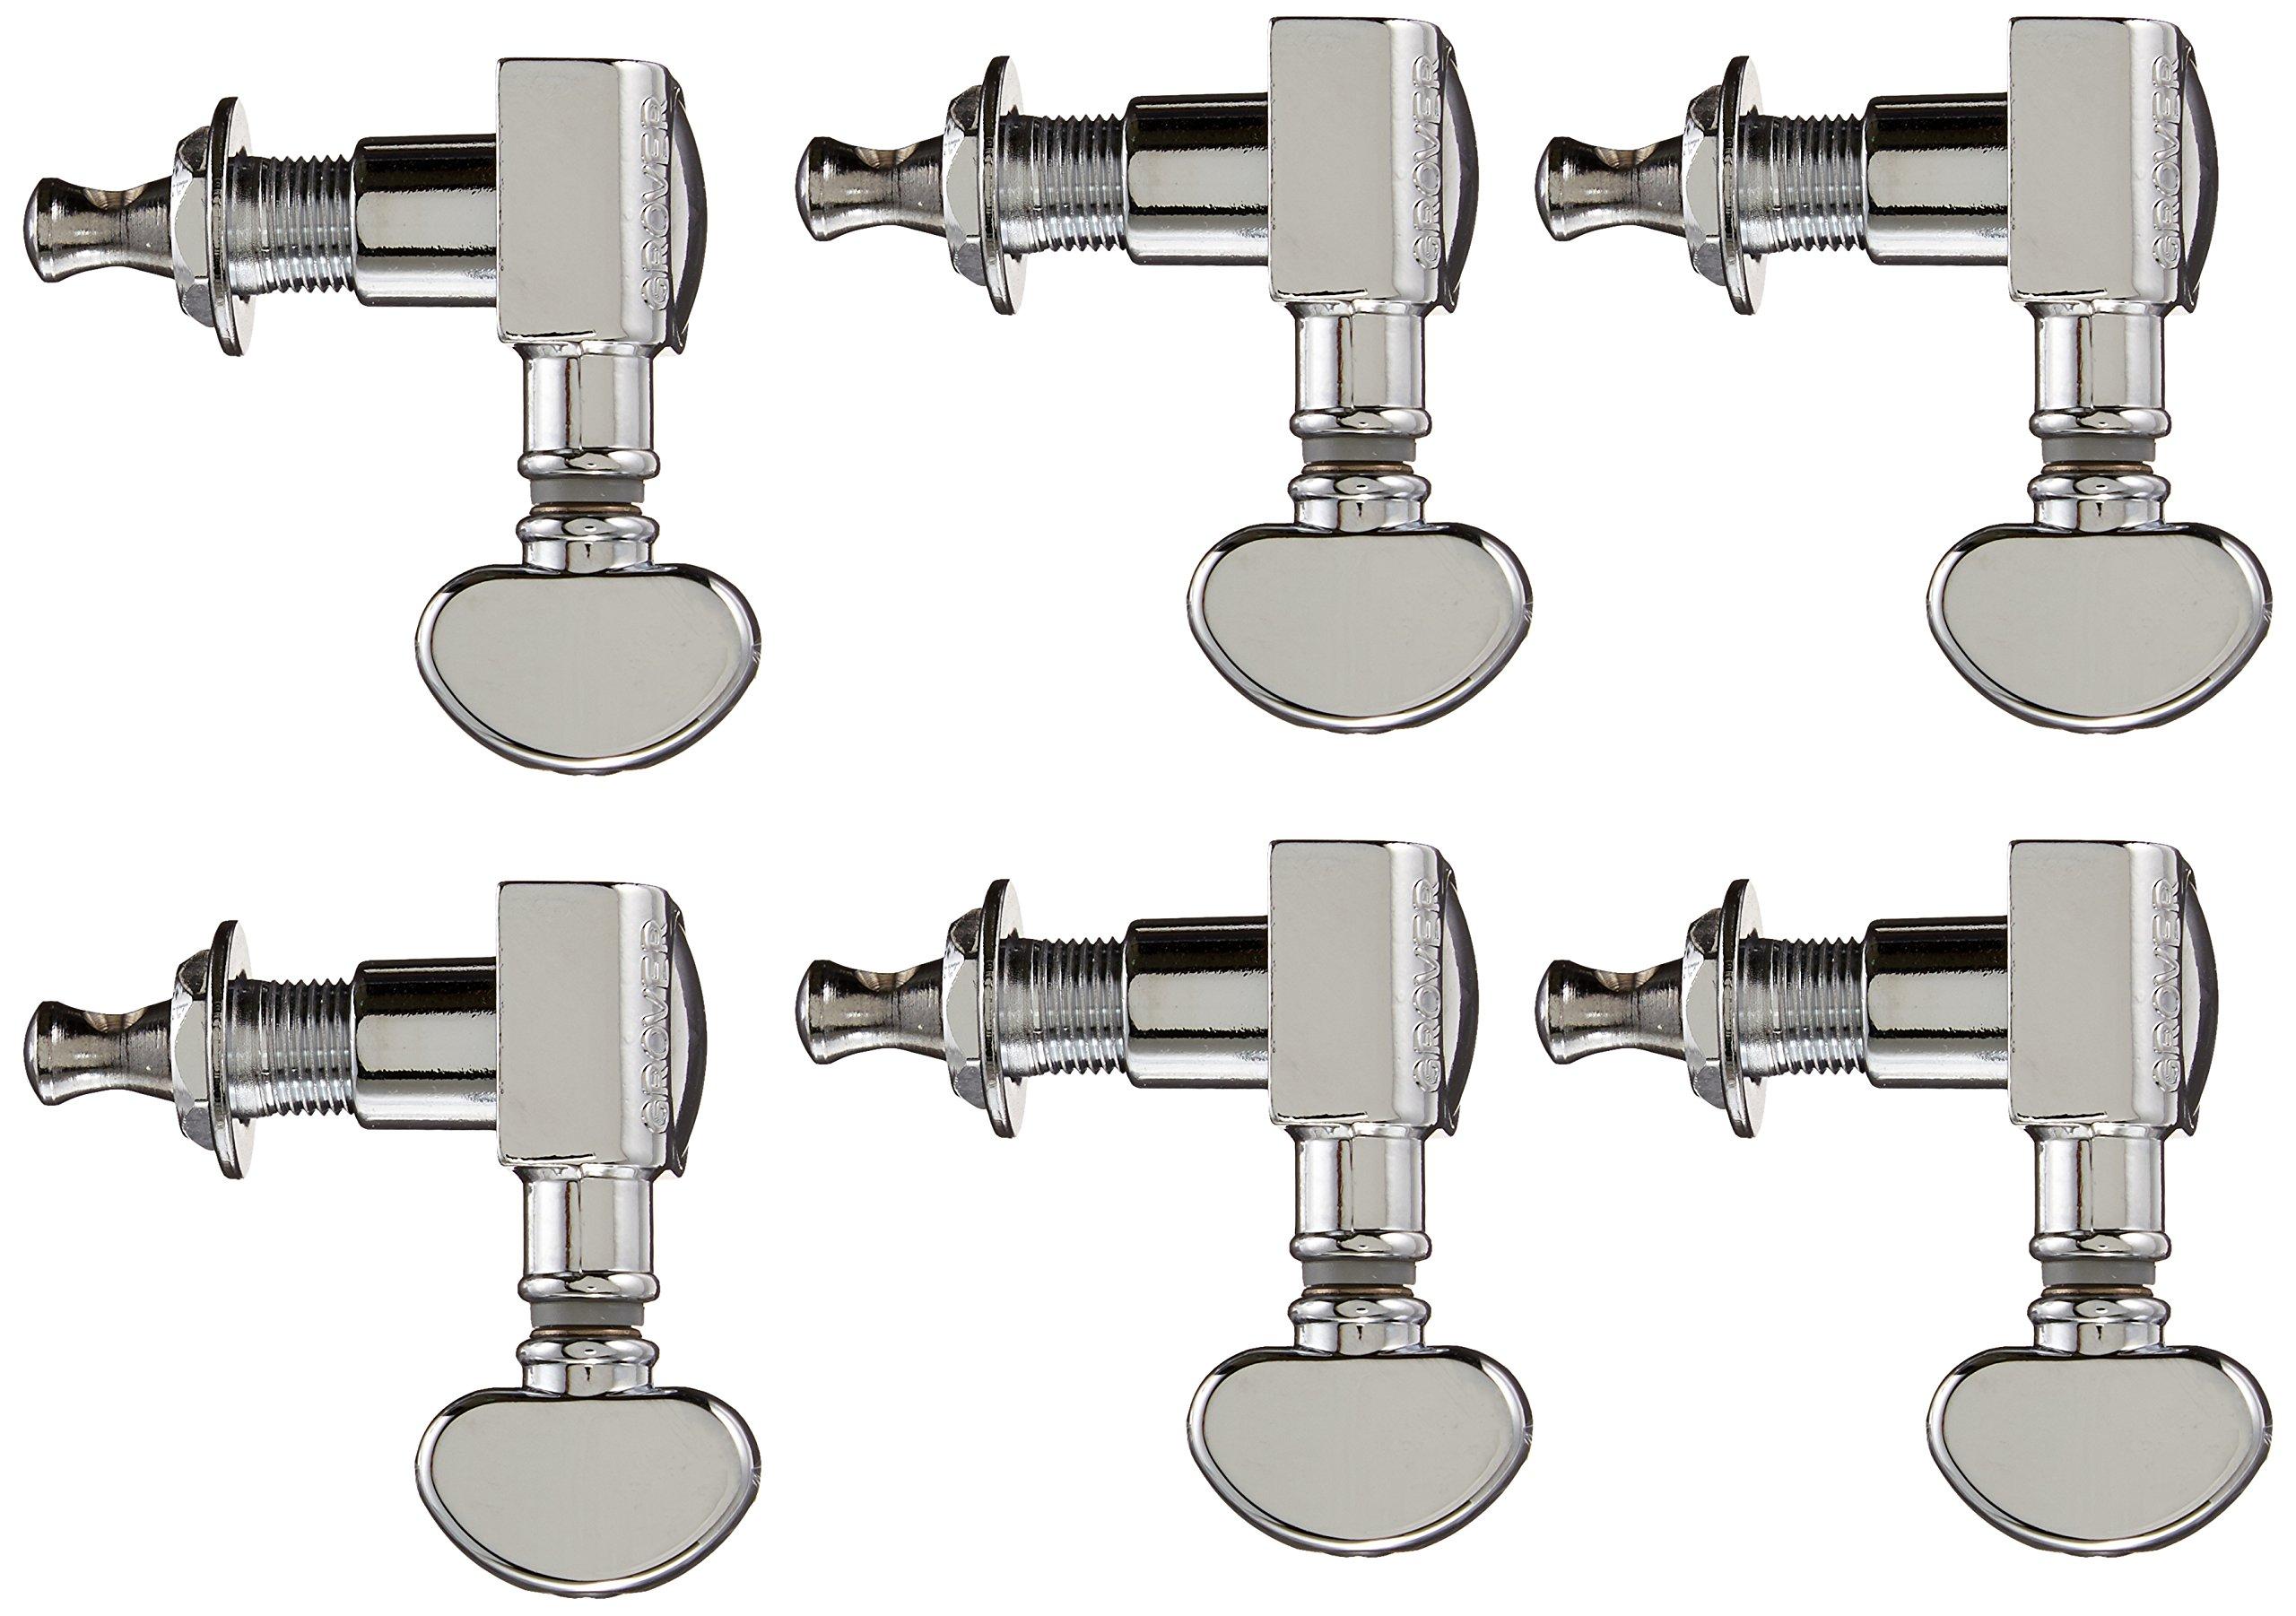 Grover 305C Midsize Rotomatic 18:1 Machine Heads, Chrome